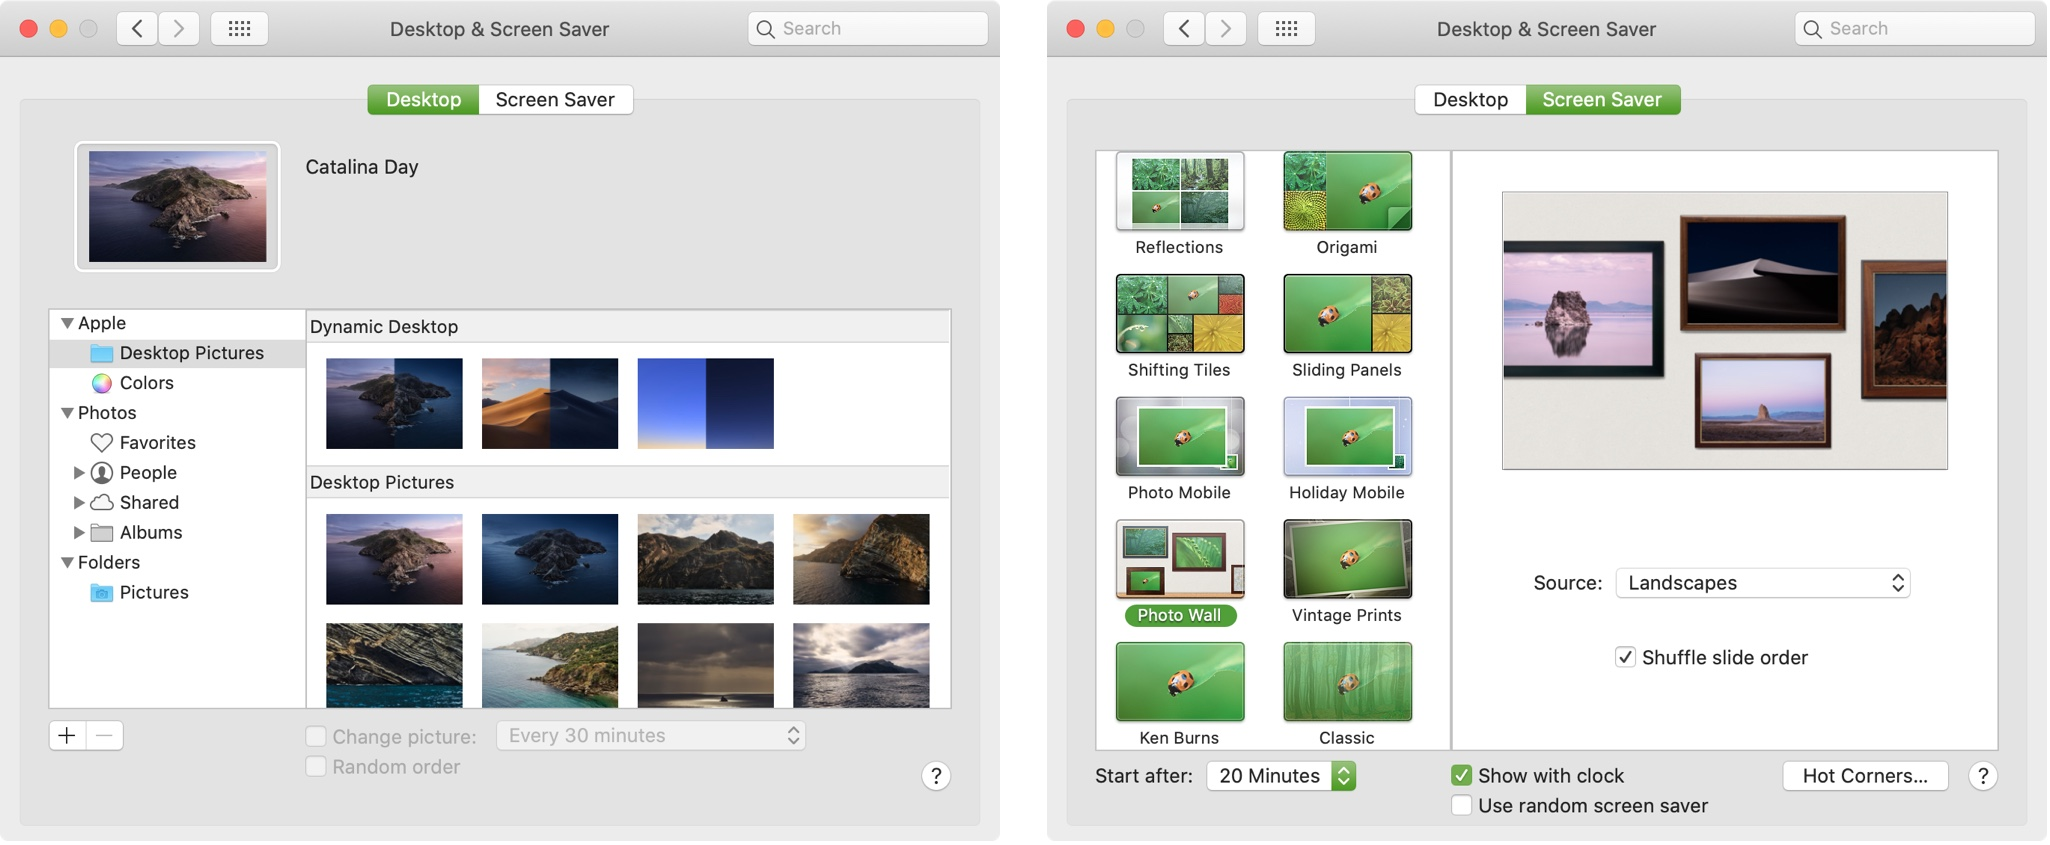 Change Desktop and Screen Saver Mac